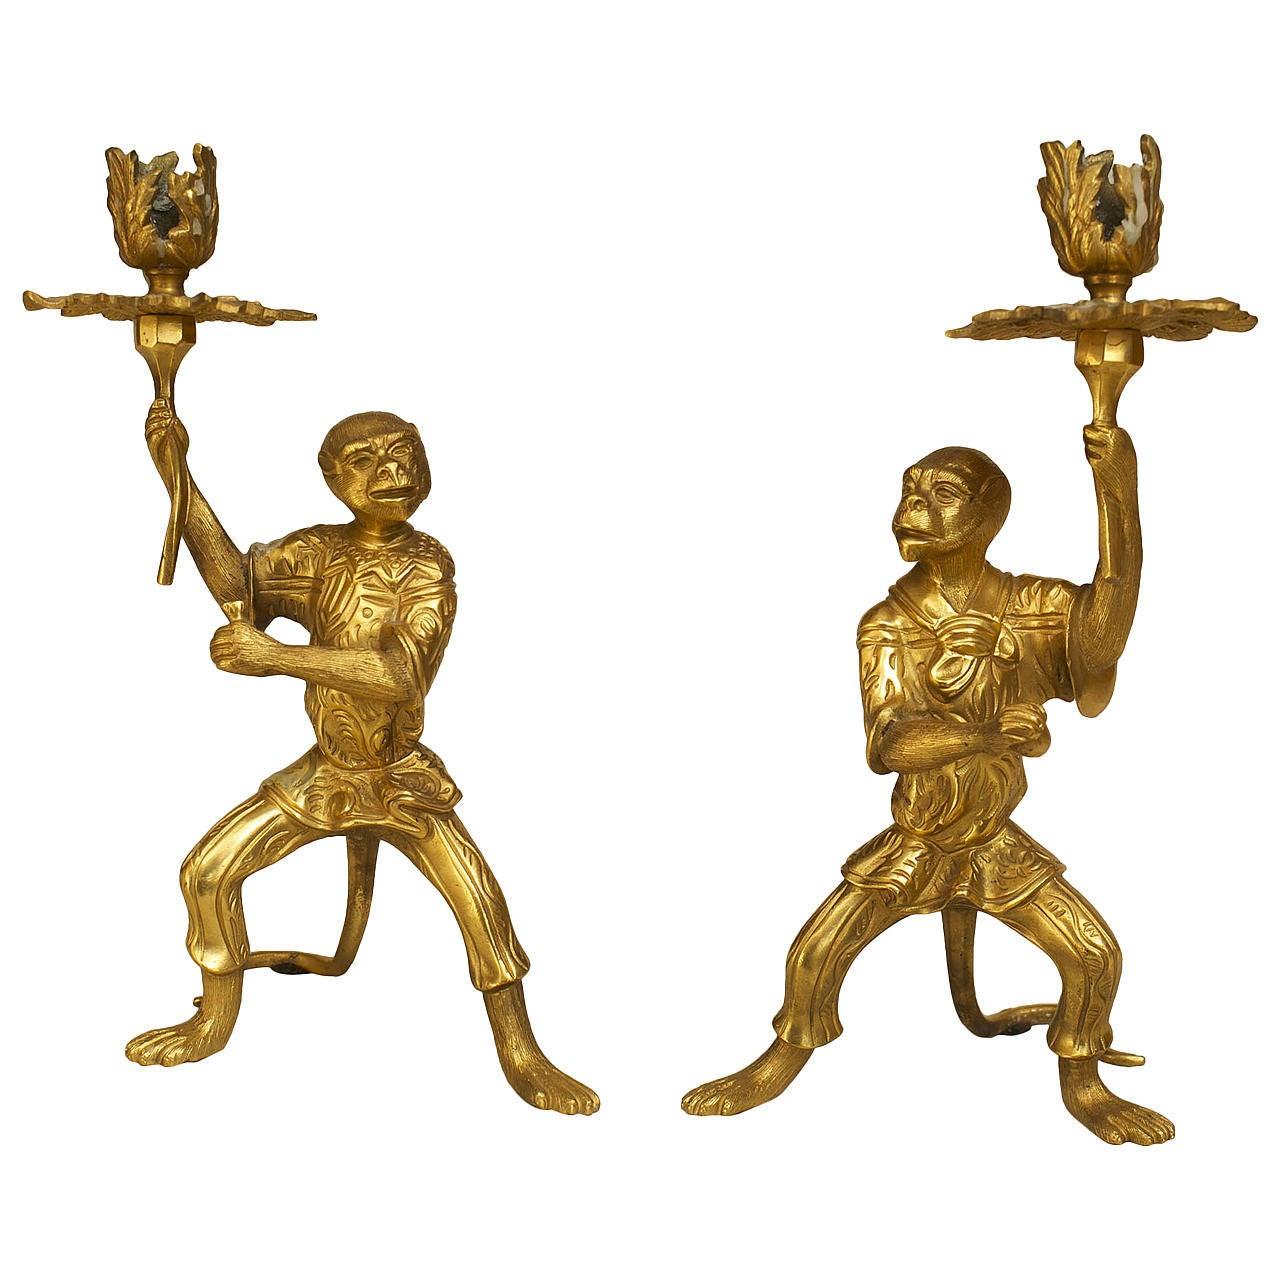 Pair of French Louis XVI Style Bronze Dore Monkey Candlesticks